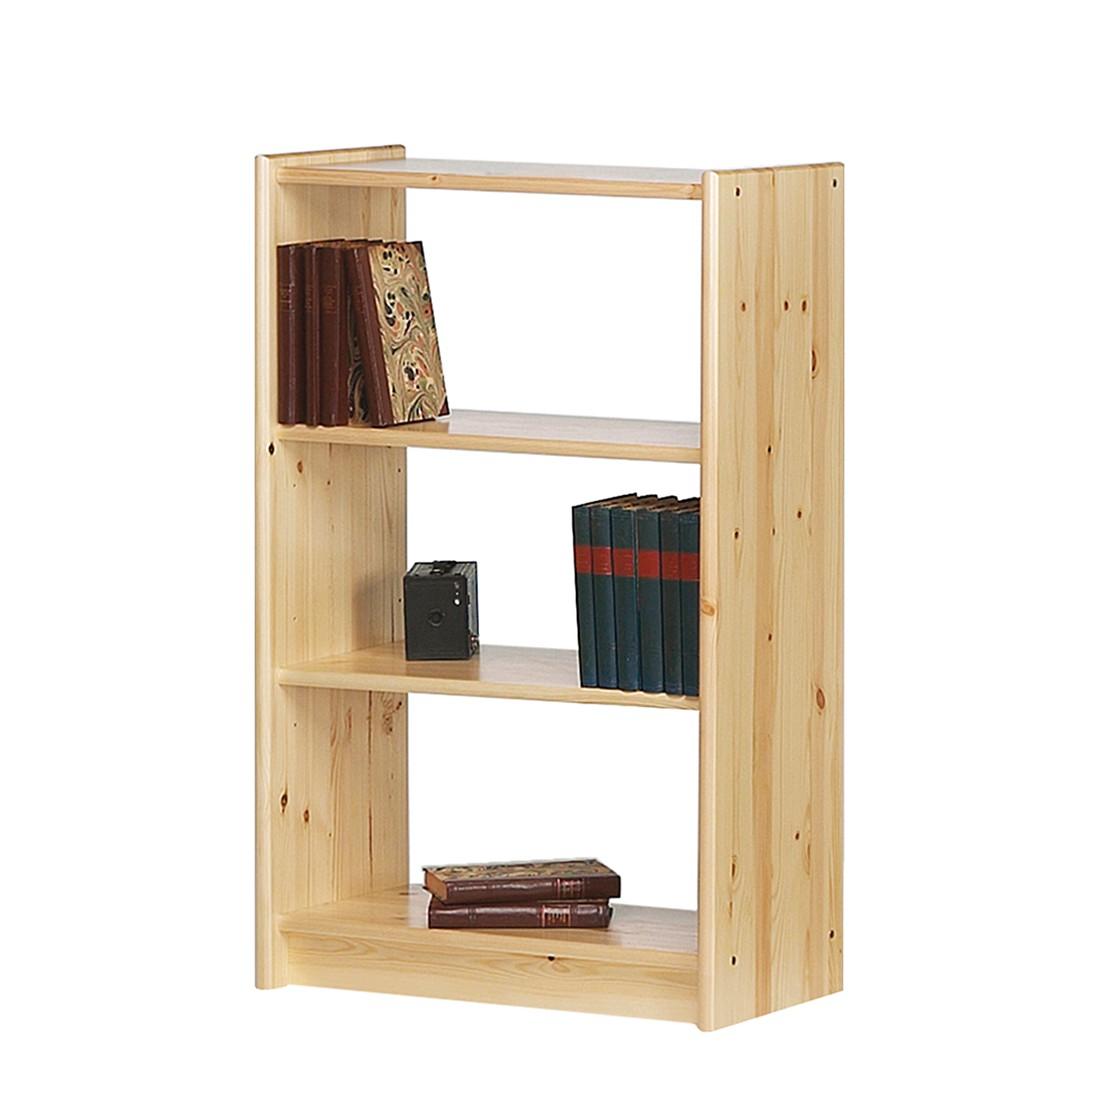 Bücherregal Tomke I - Kiefer massiv - Natur, Steens